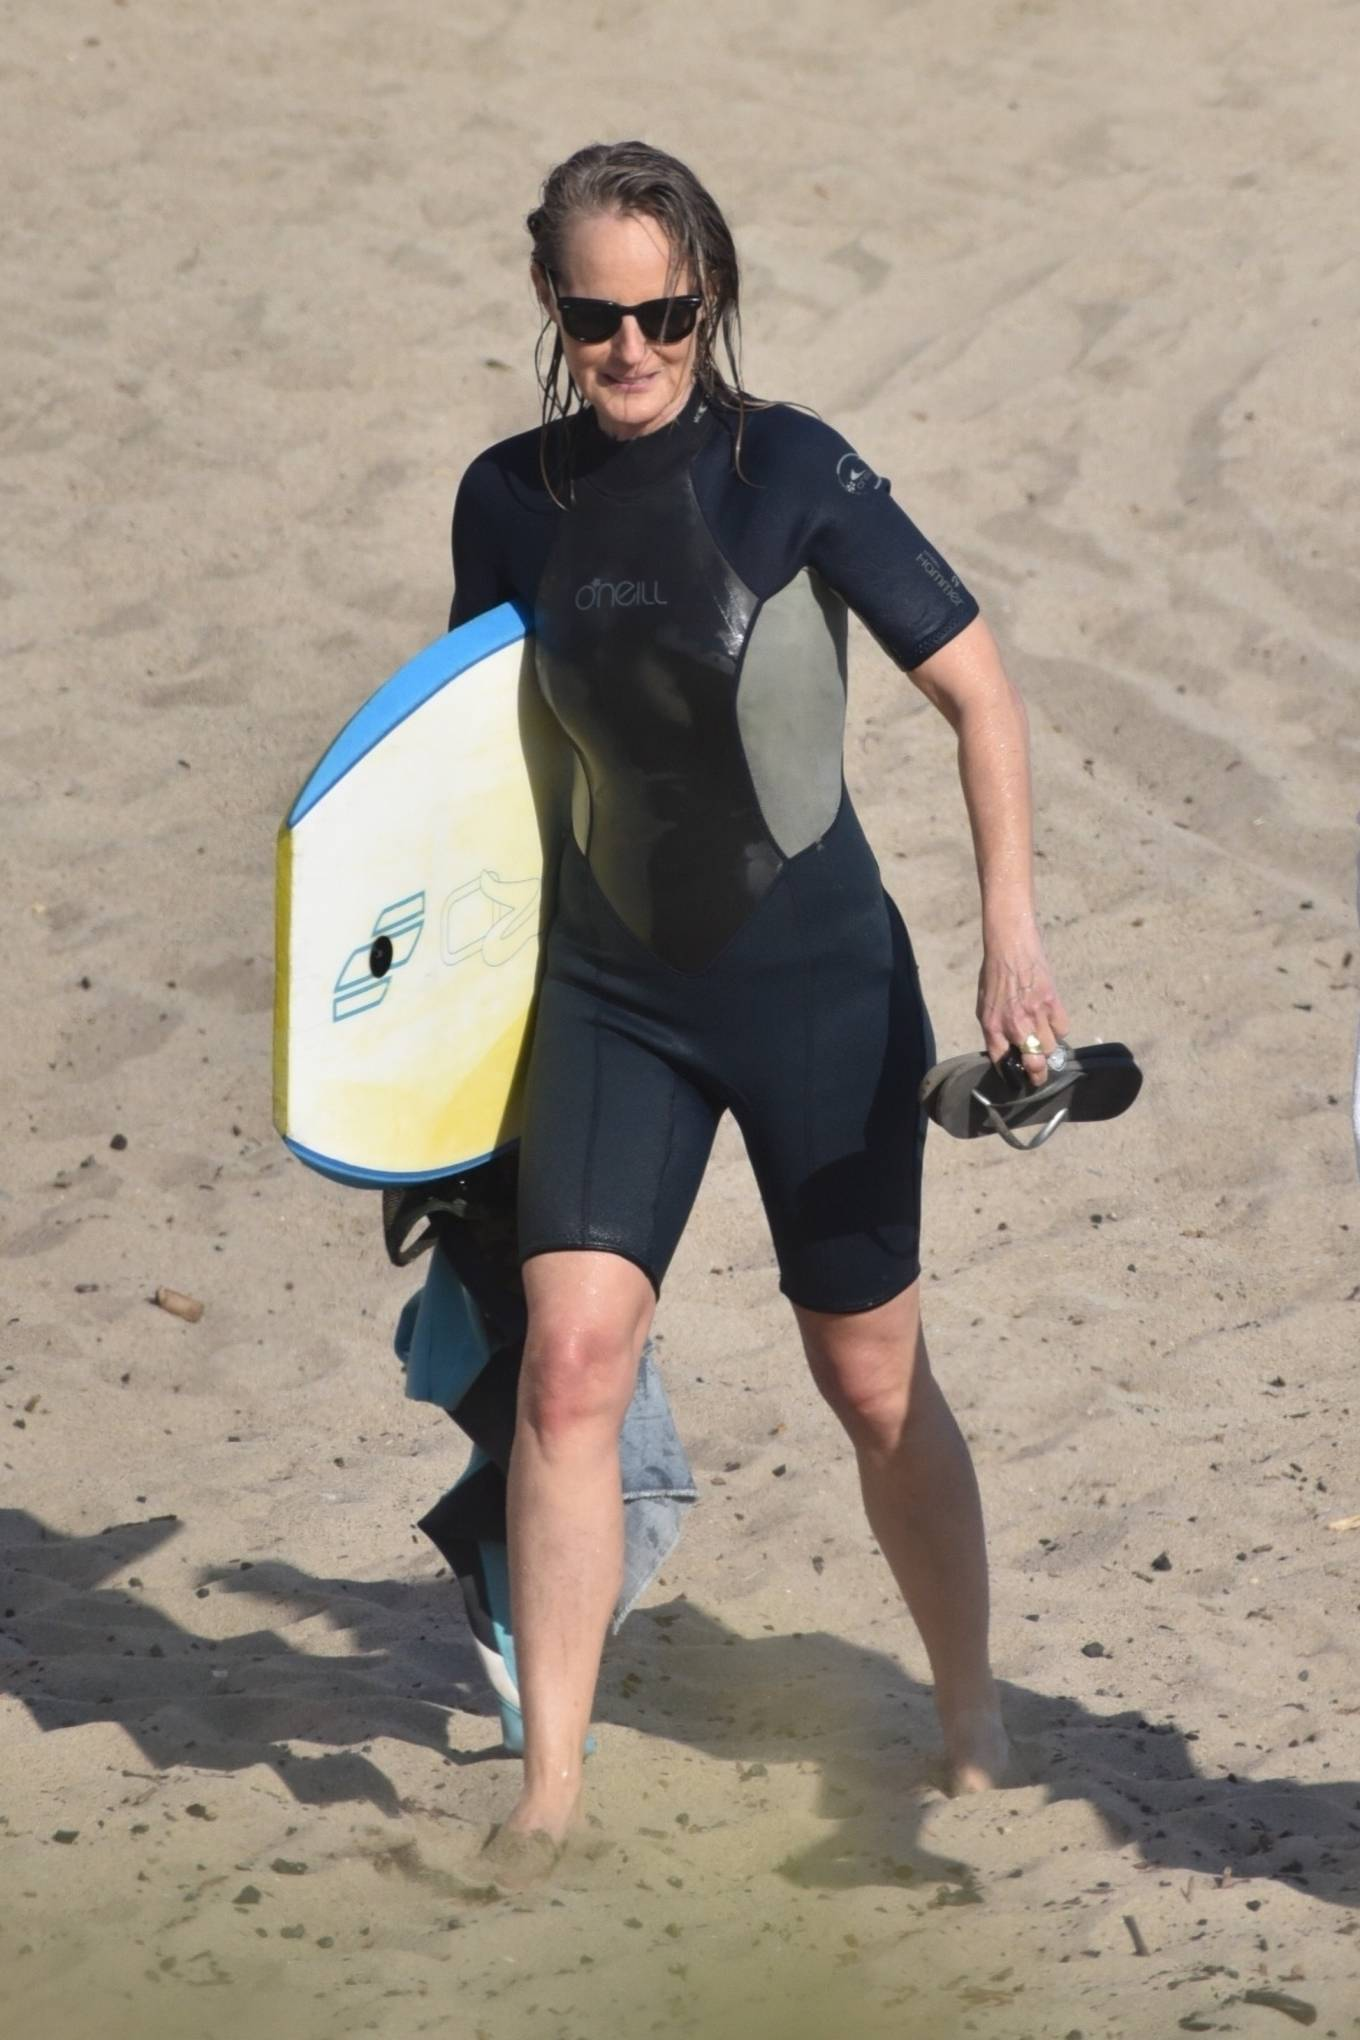 Helen Hunt - Bodyboarding session with a friend in Malibu